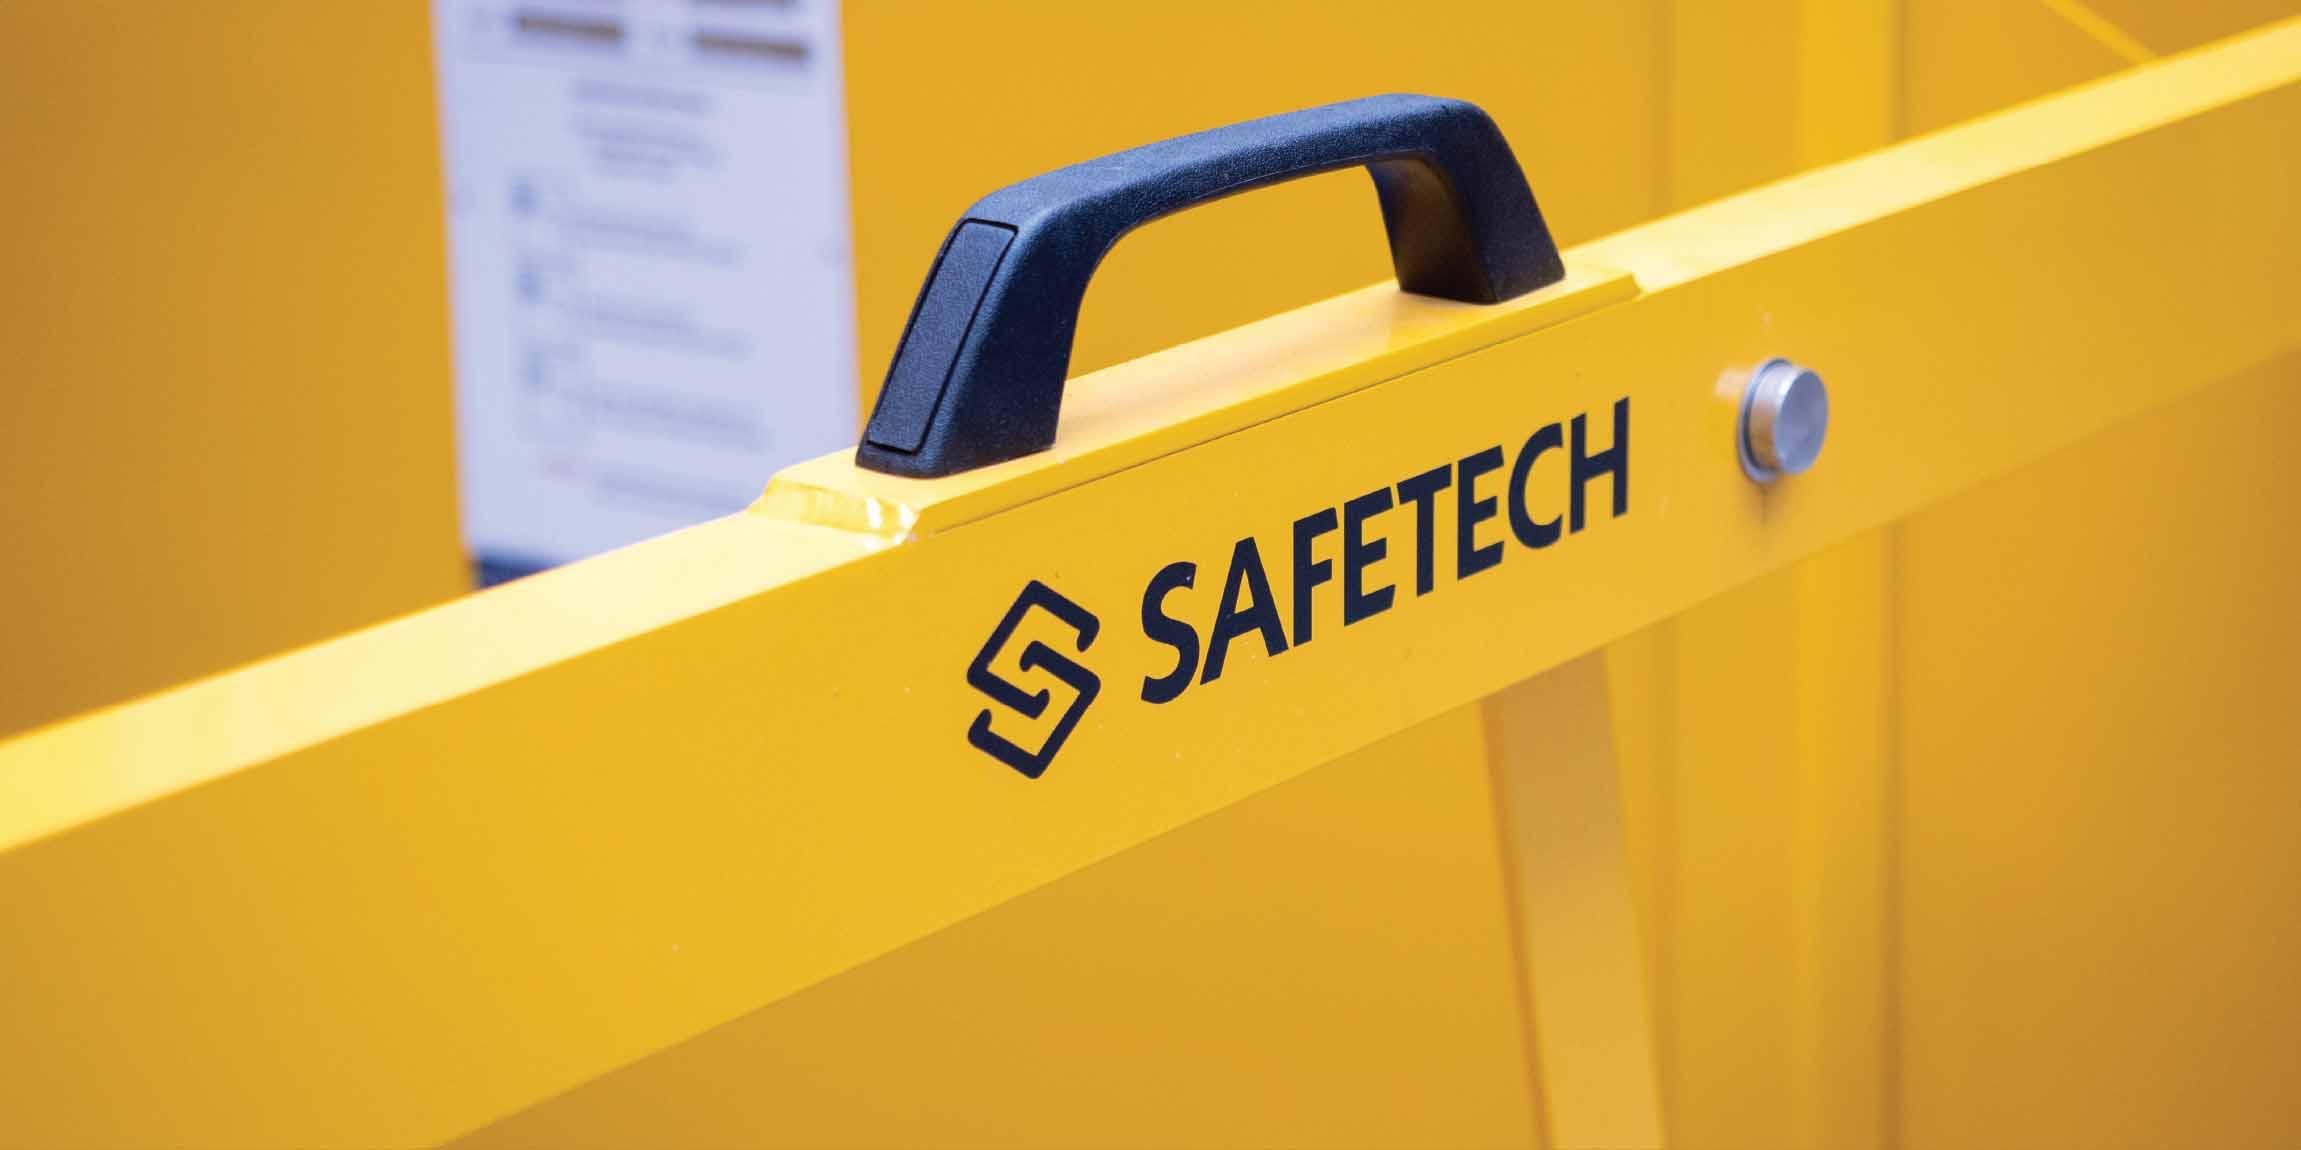 Safetech-LoLift-_handrail_01